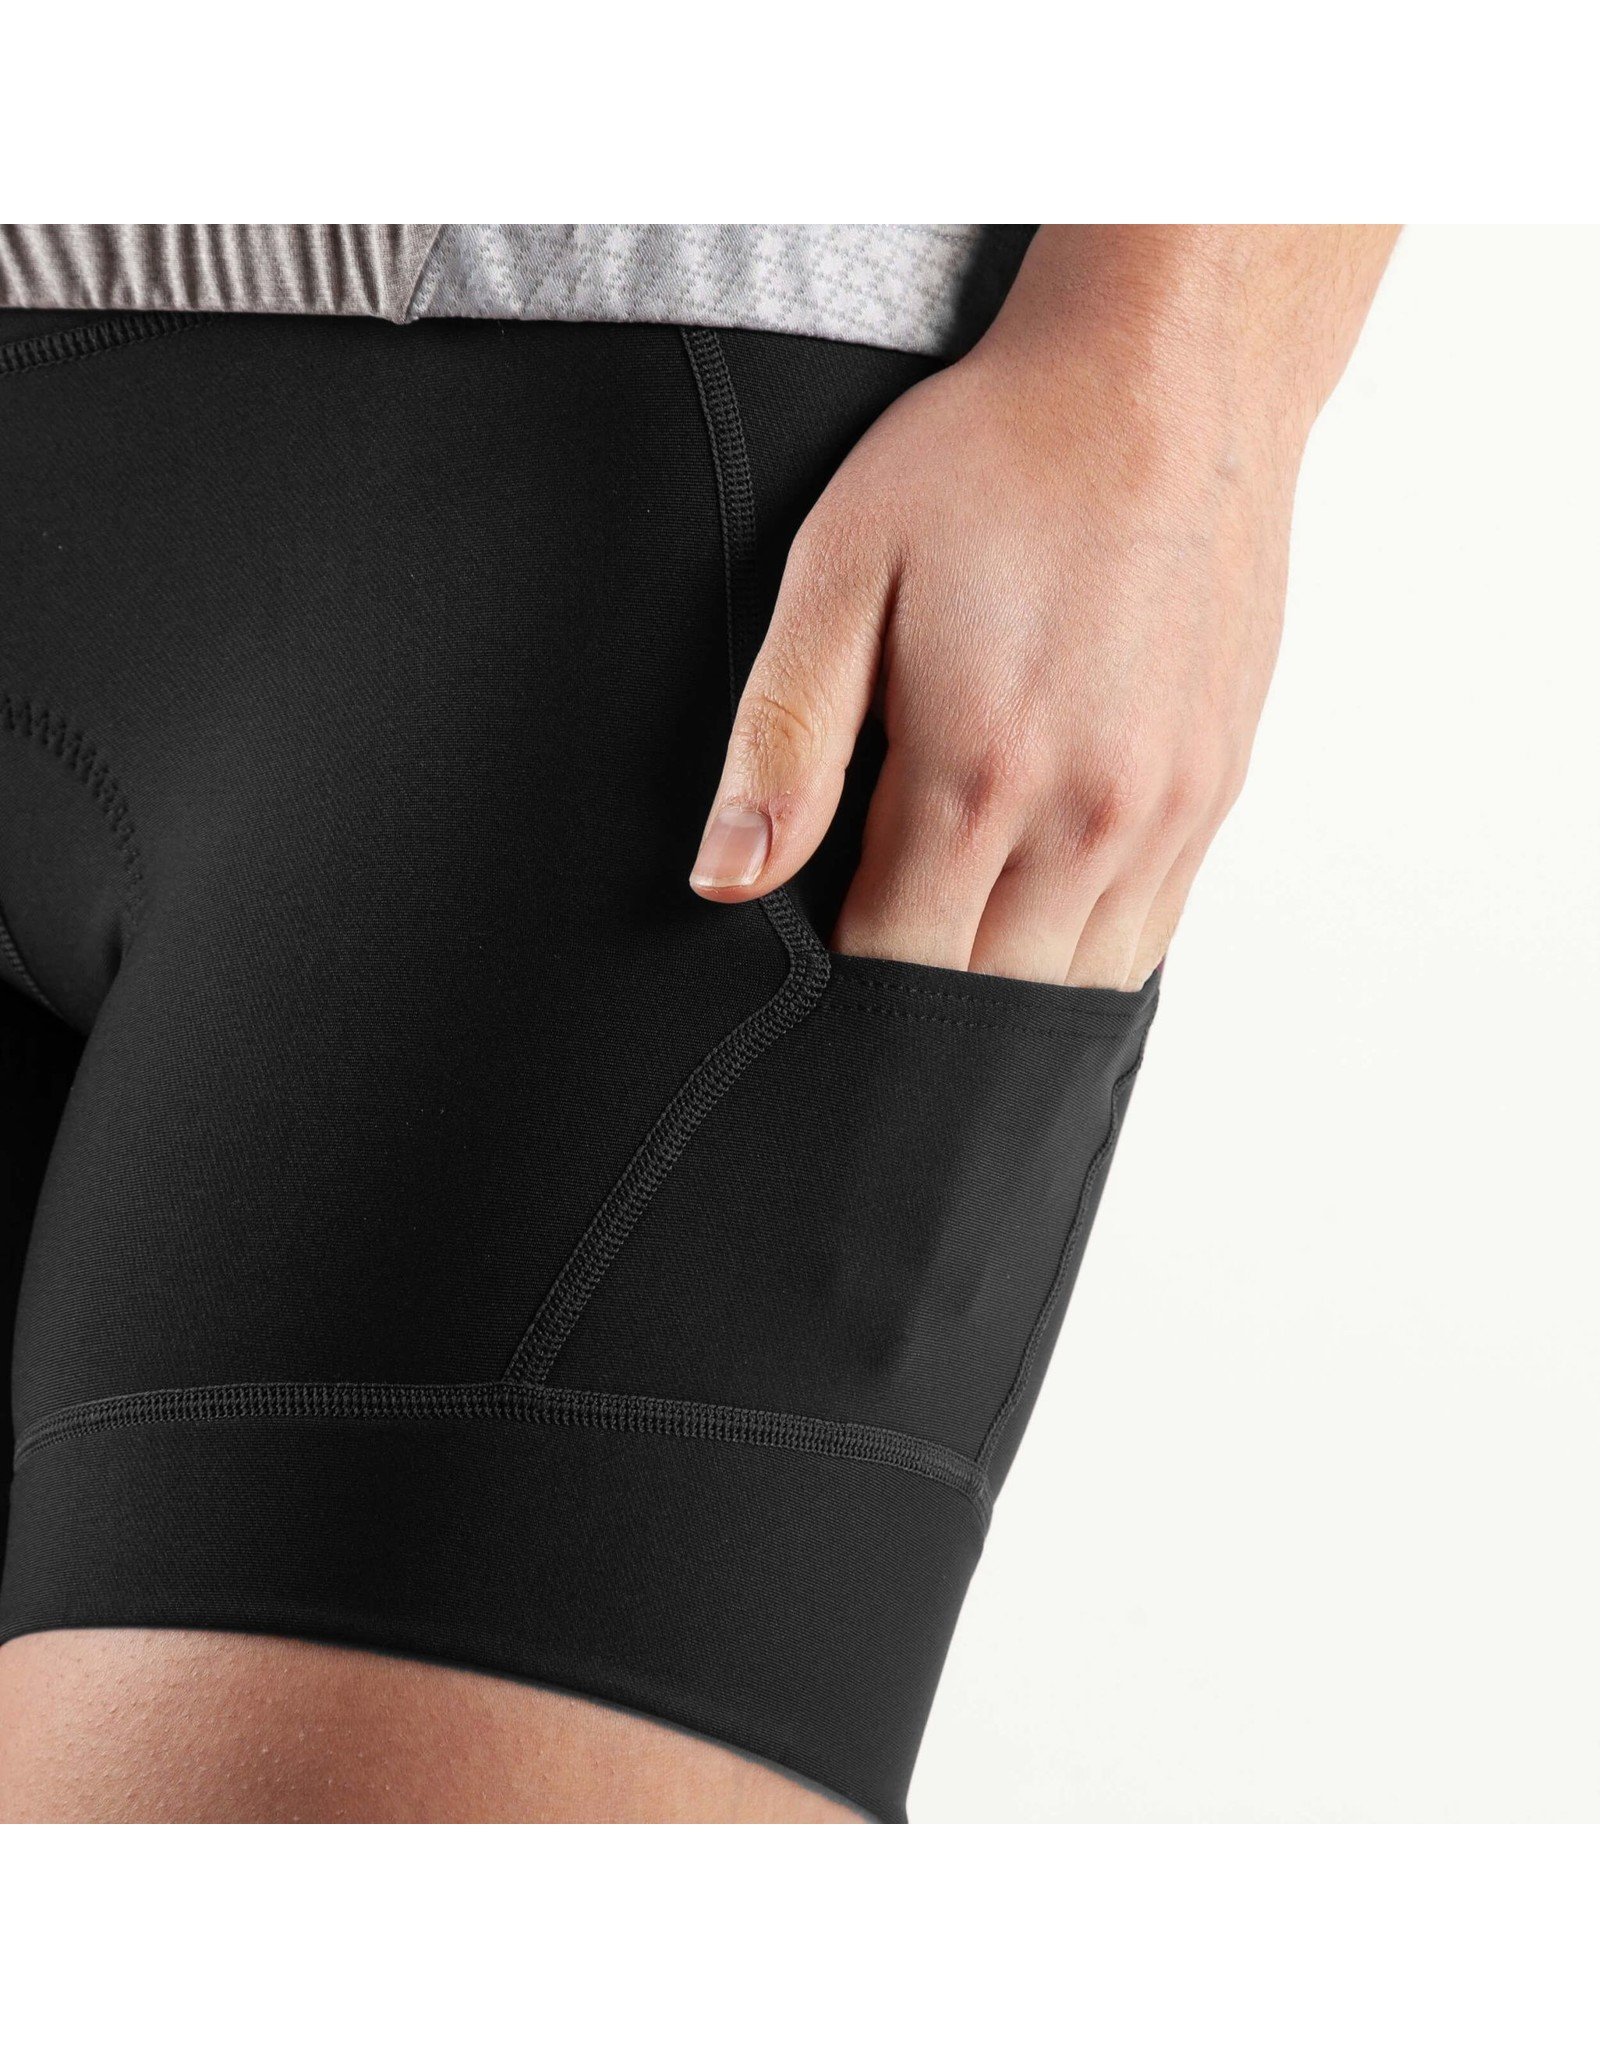 Garneau Garneau - Women Fit Sensor 5.5 Short 2 Black L